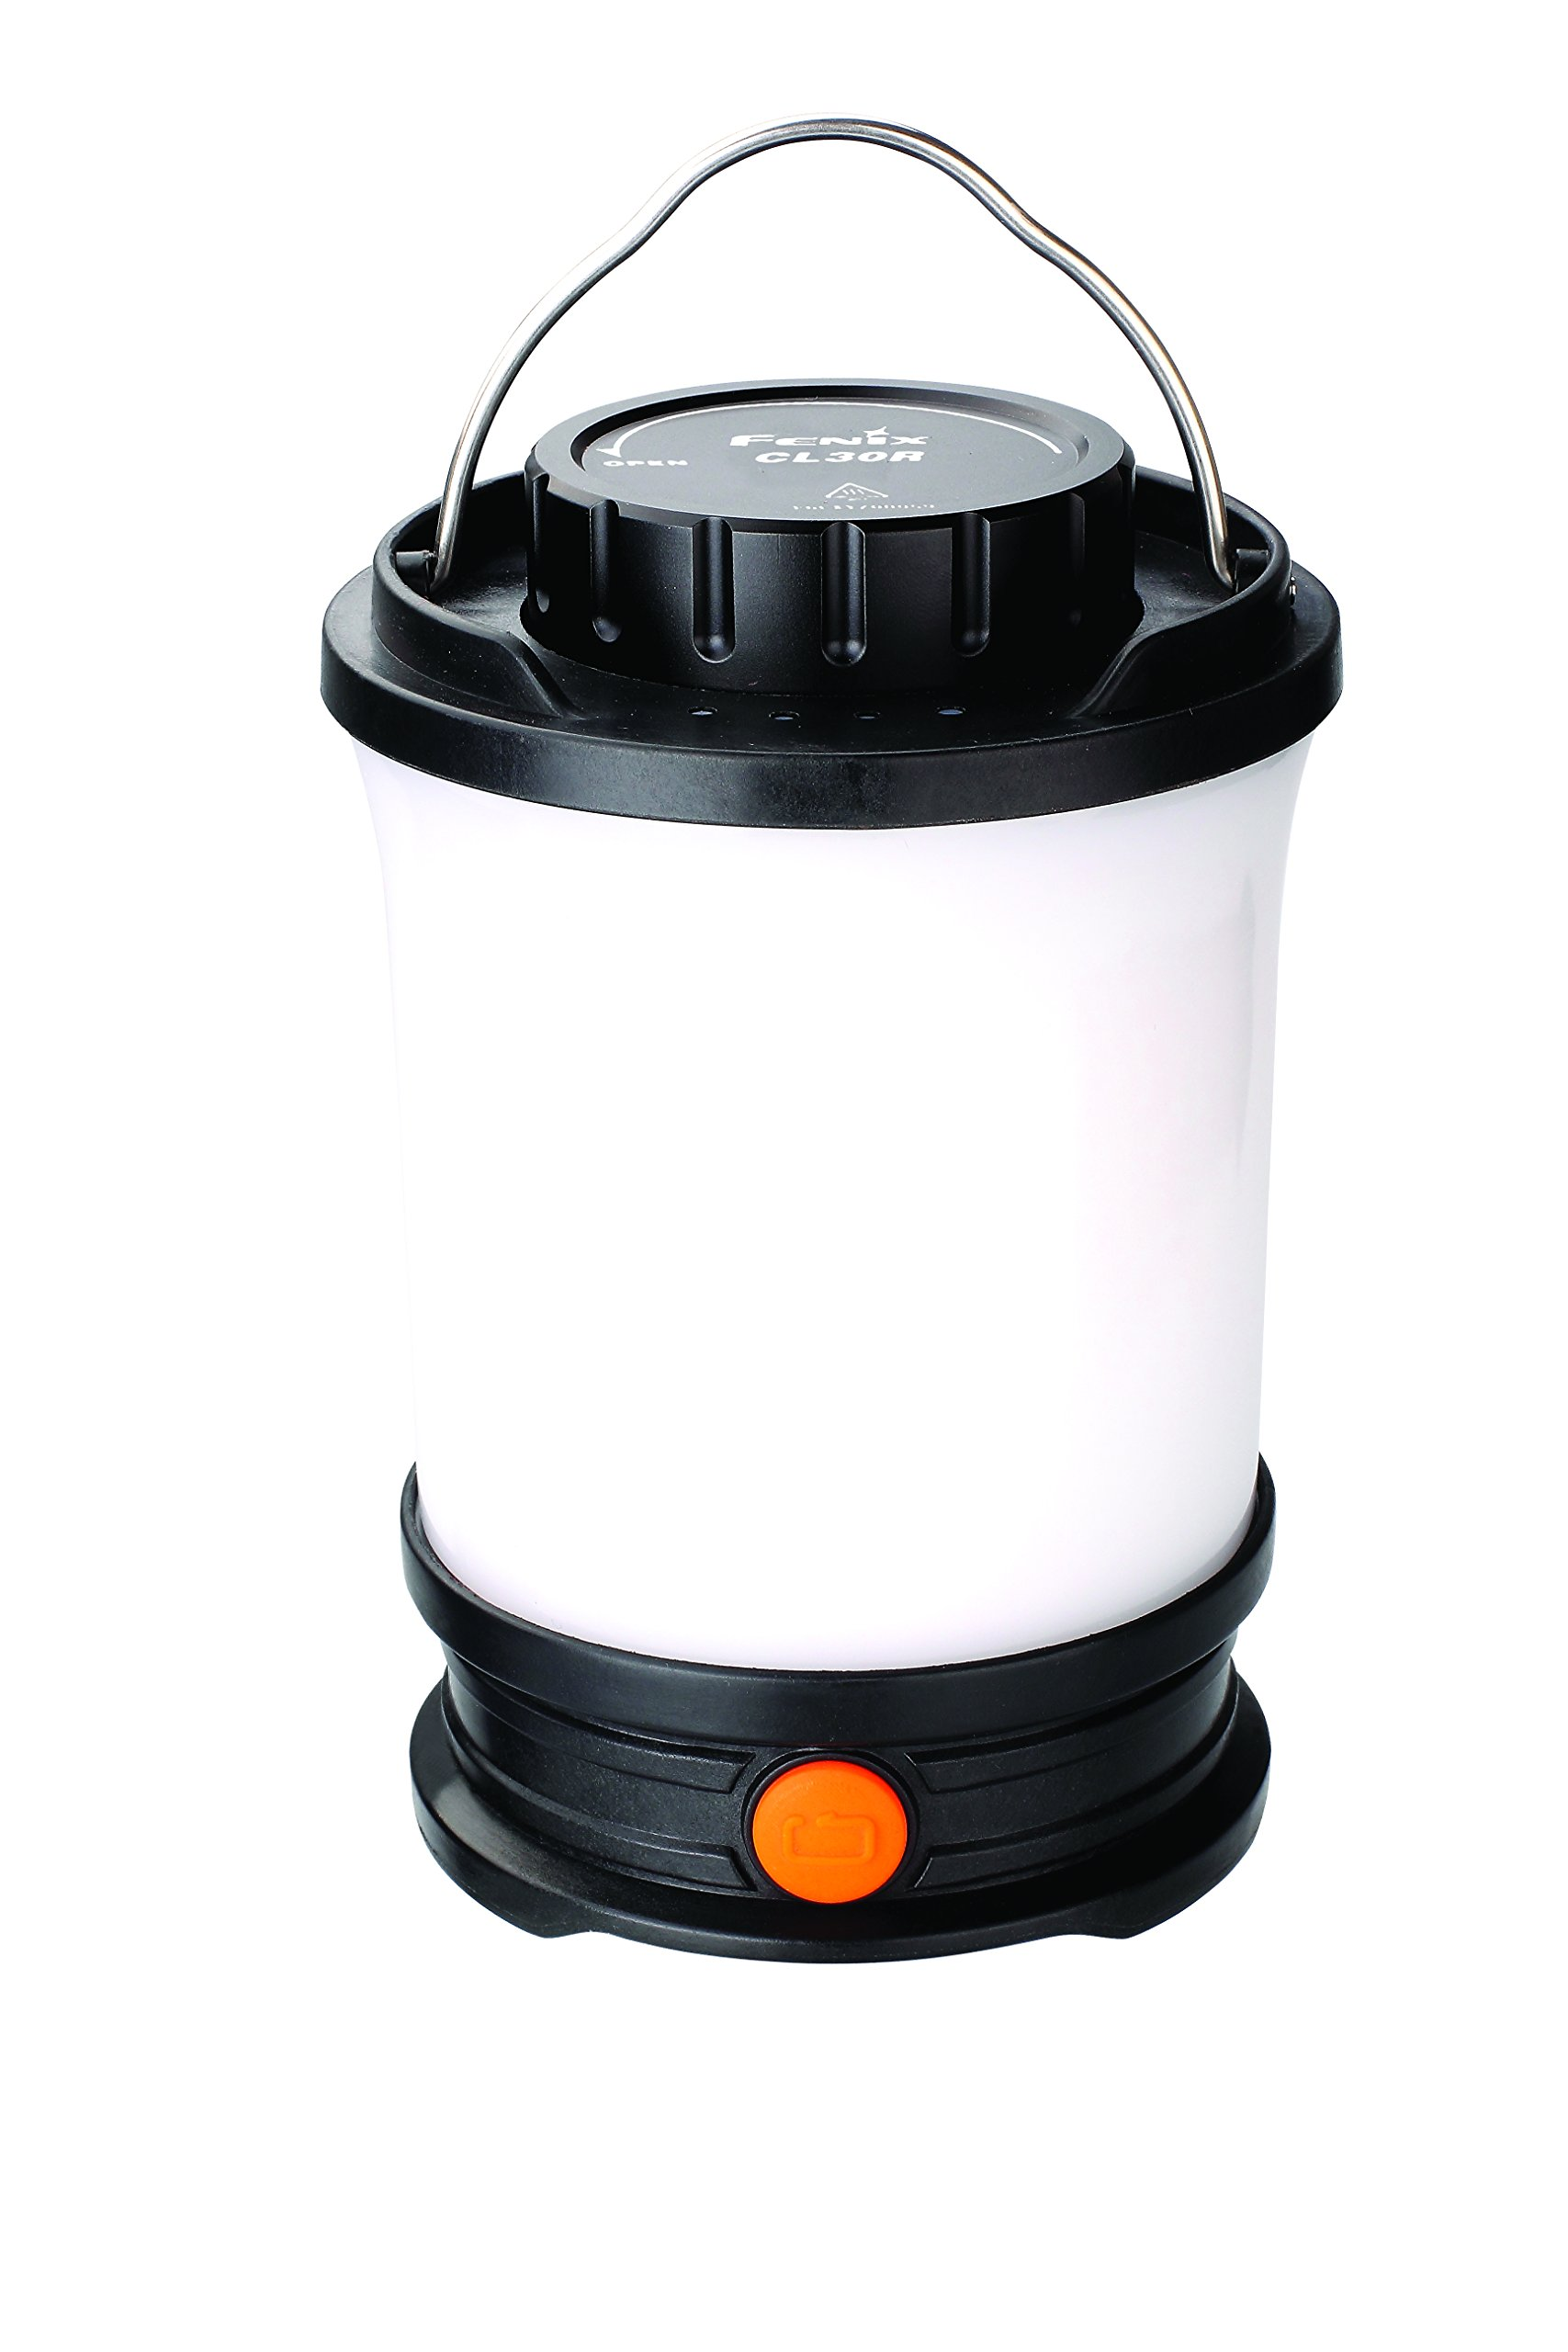 Fenix Flashlights CL30R Camping Lantern, Black by Fenix Flashlights (Image #1)